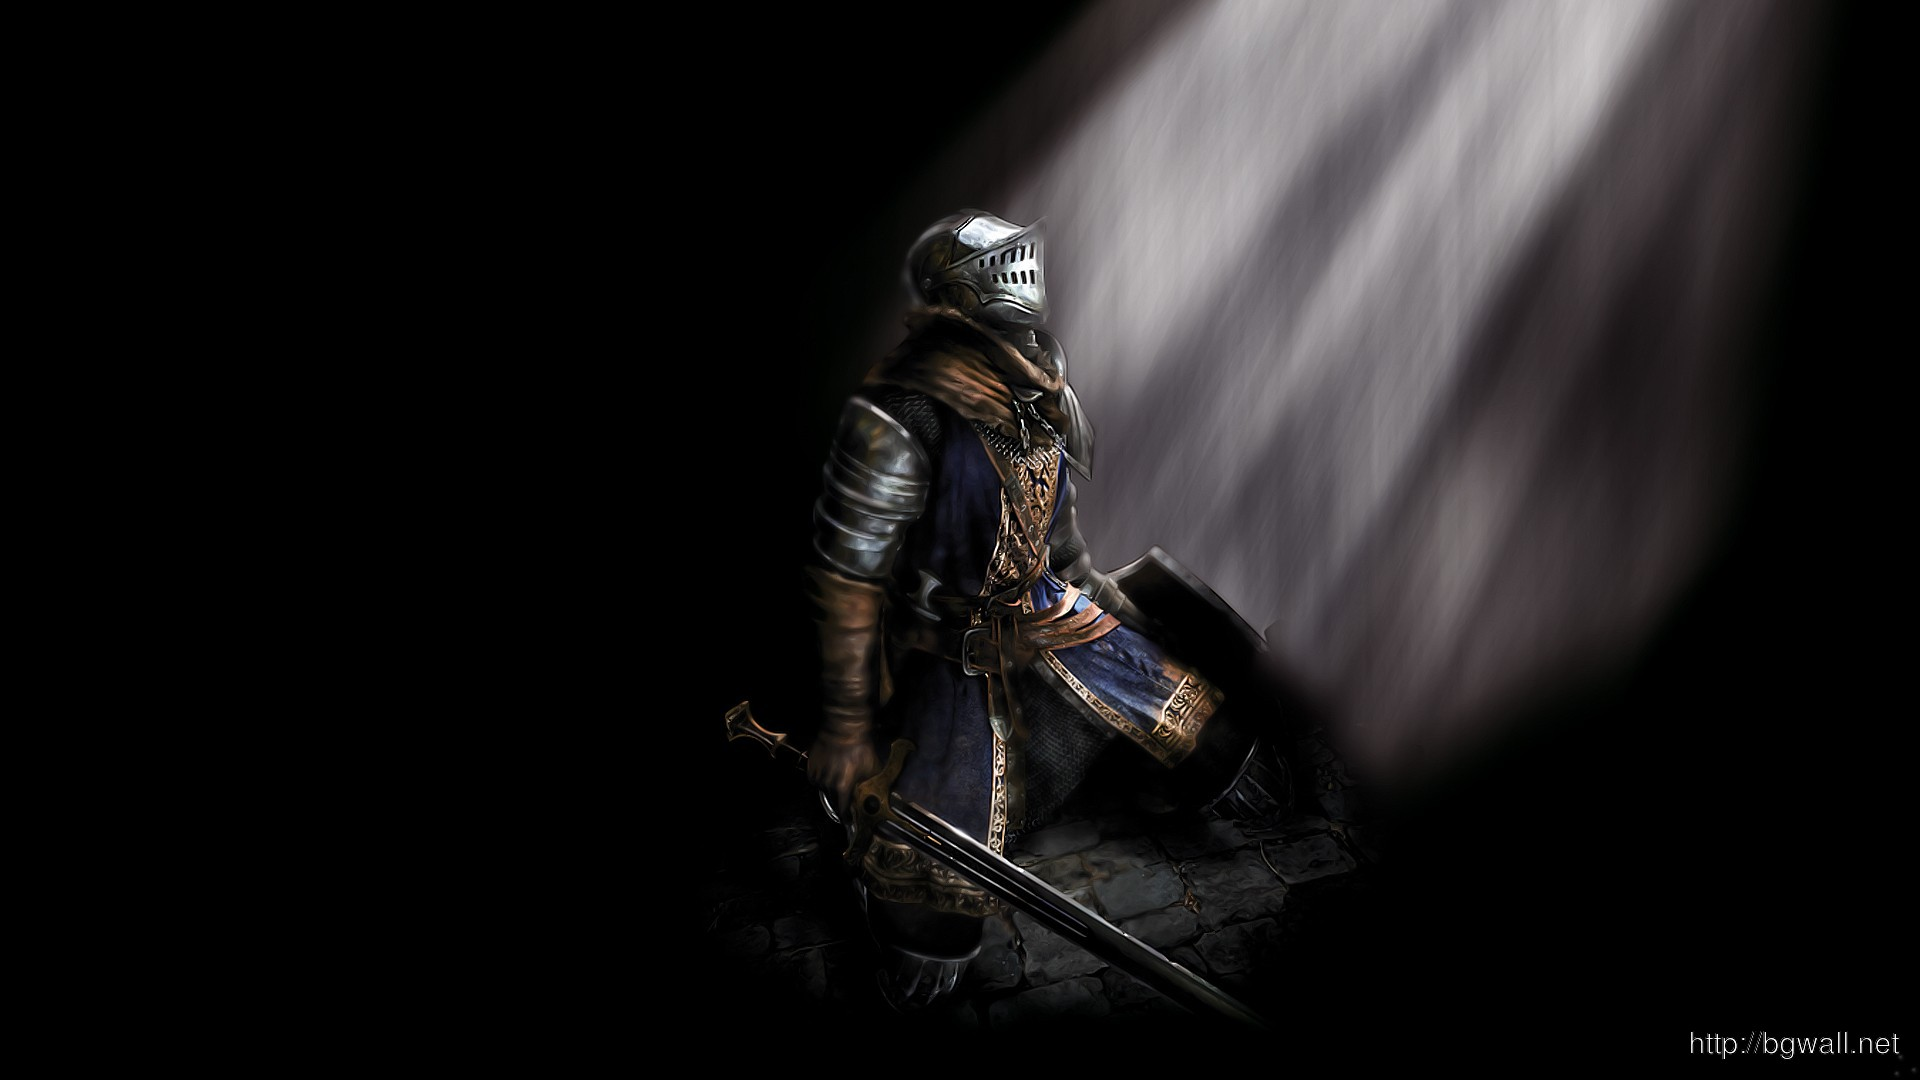 Dark Souls 2 Awesome Wallpaper – Background Wallpaper HD